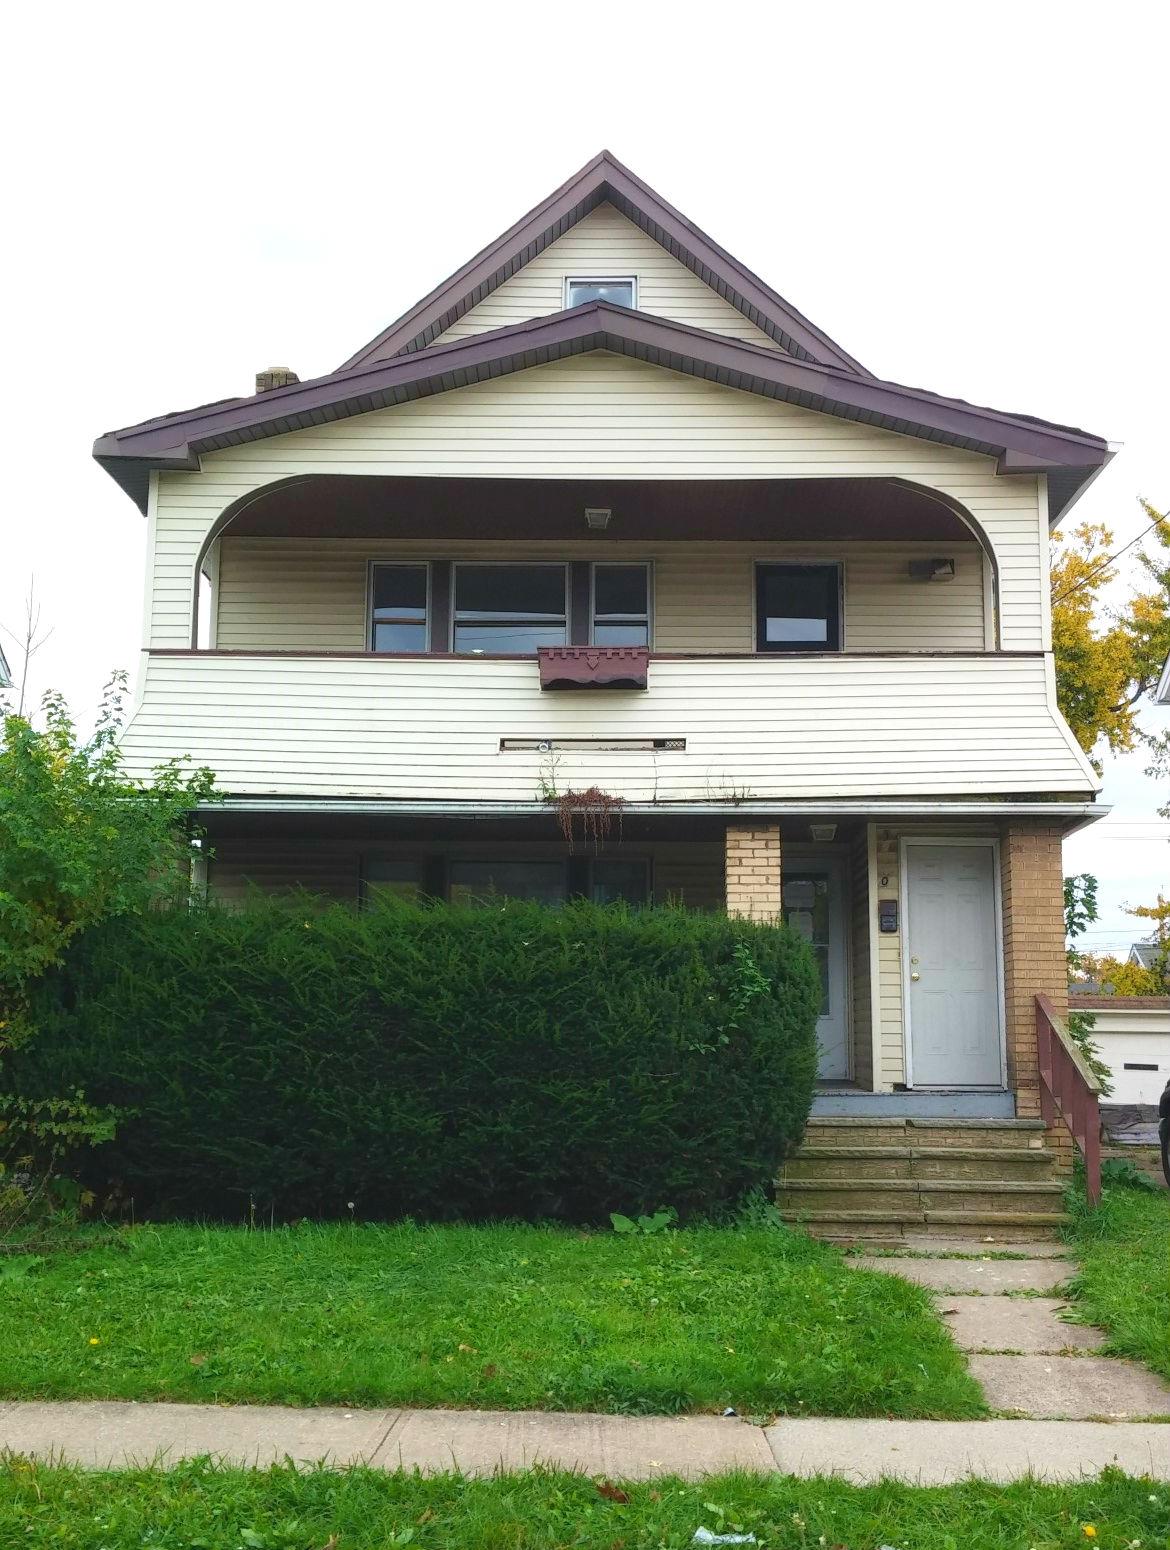 11800 Avon Ave., Cleveland | 2 bed 1 bath | 1,963 Sq. Ft. | $39,500